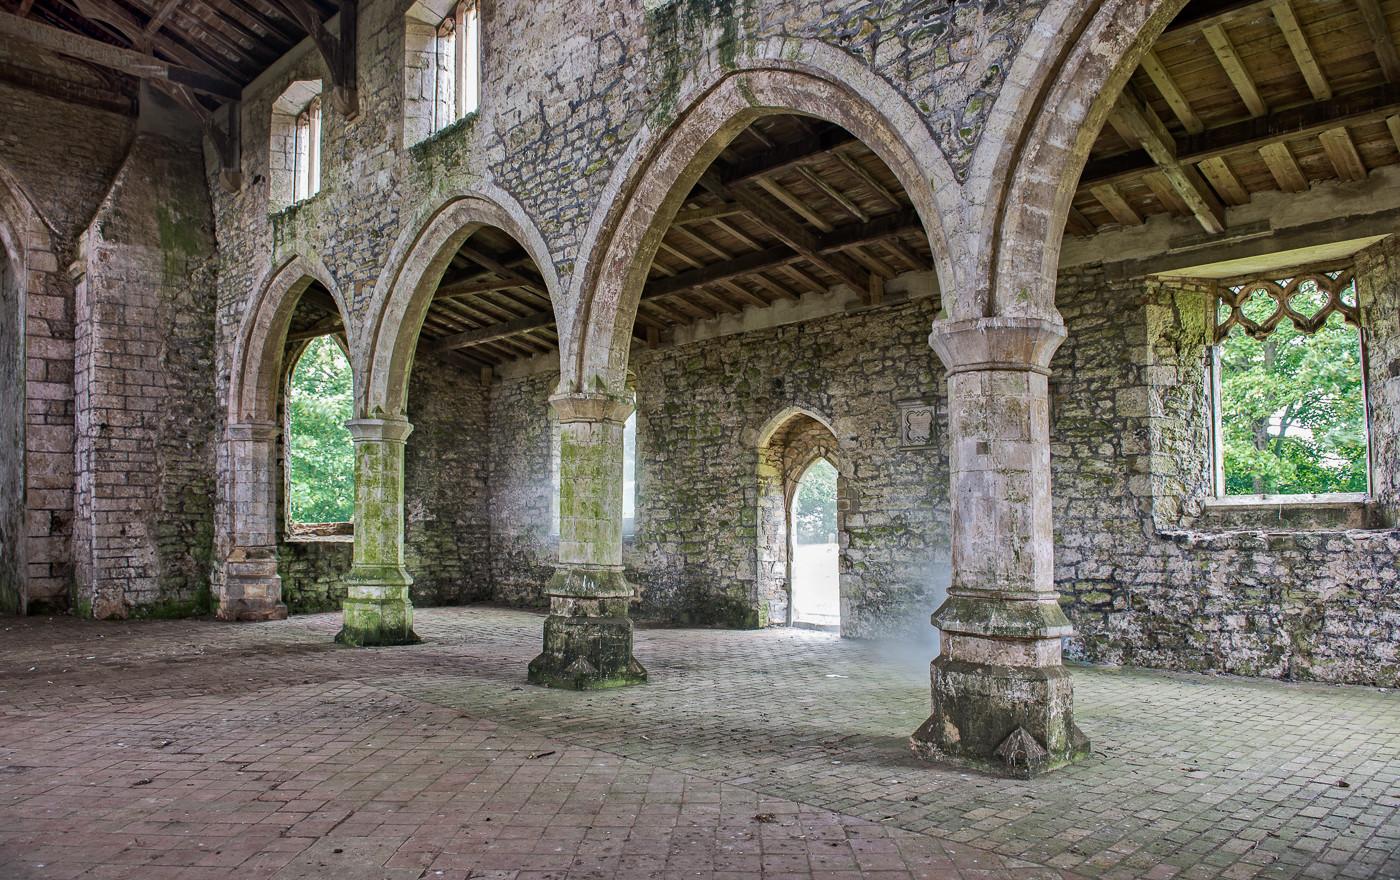 Skidbrooke Church #2